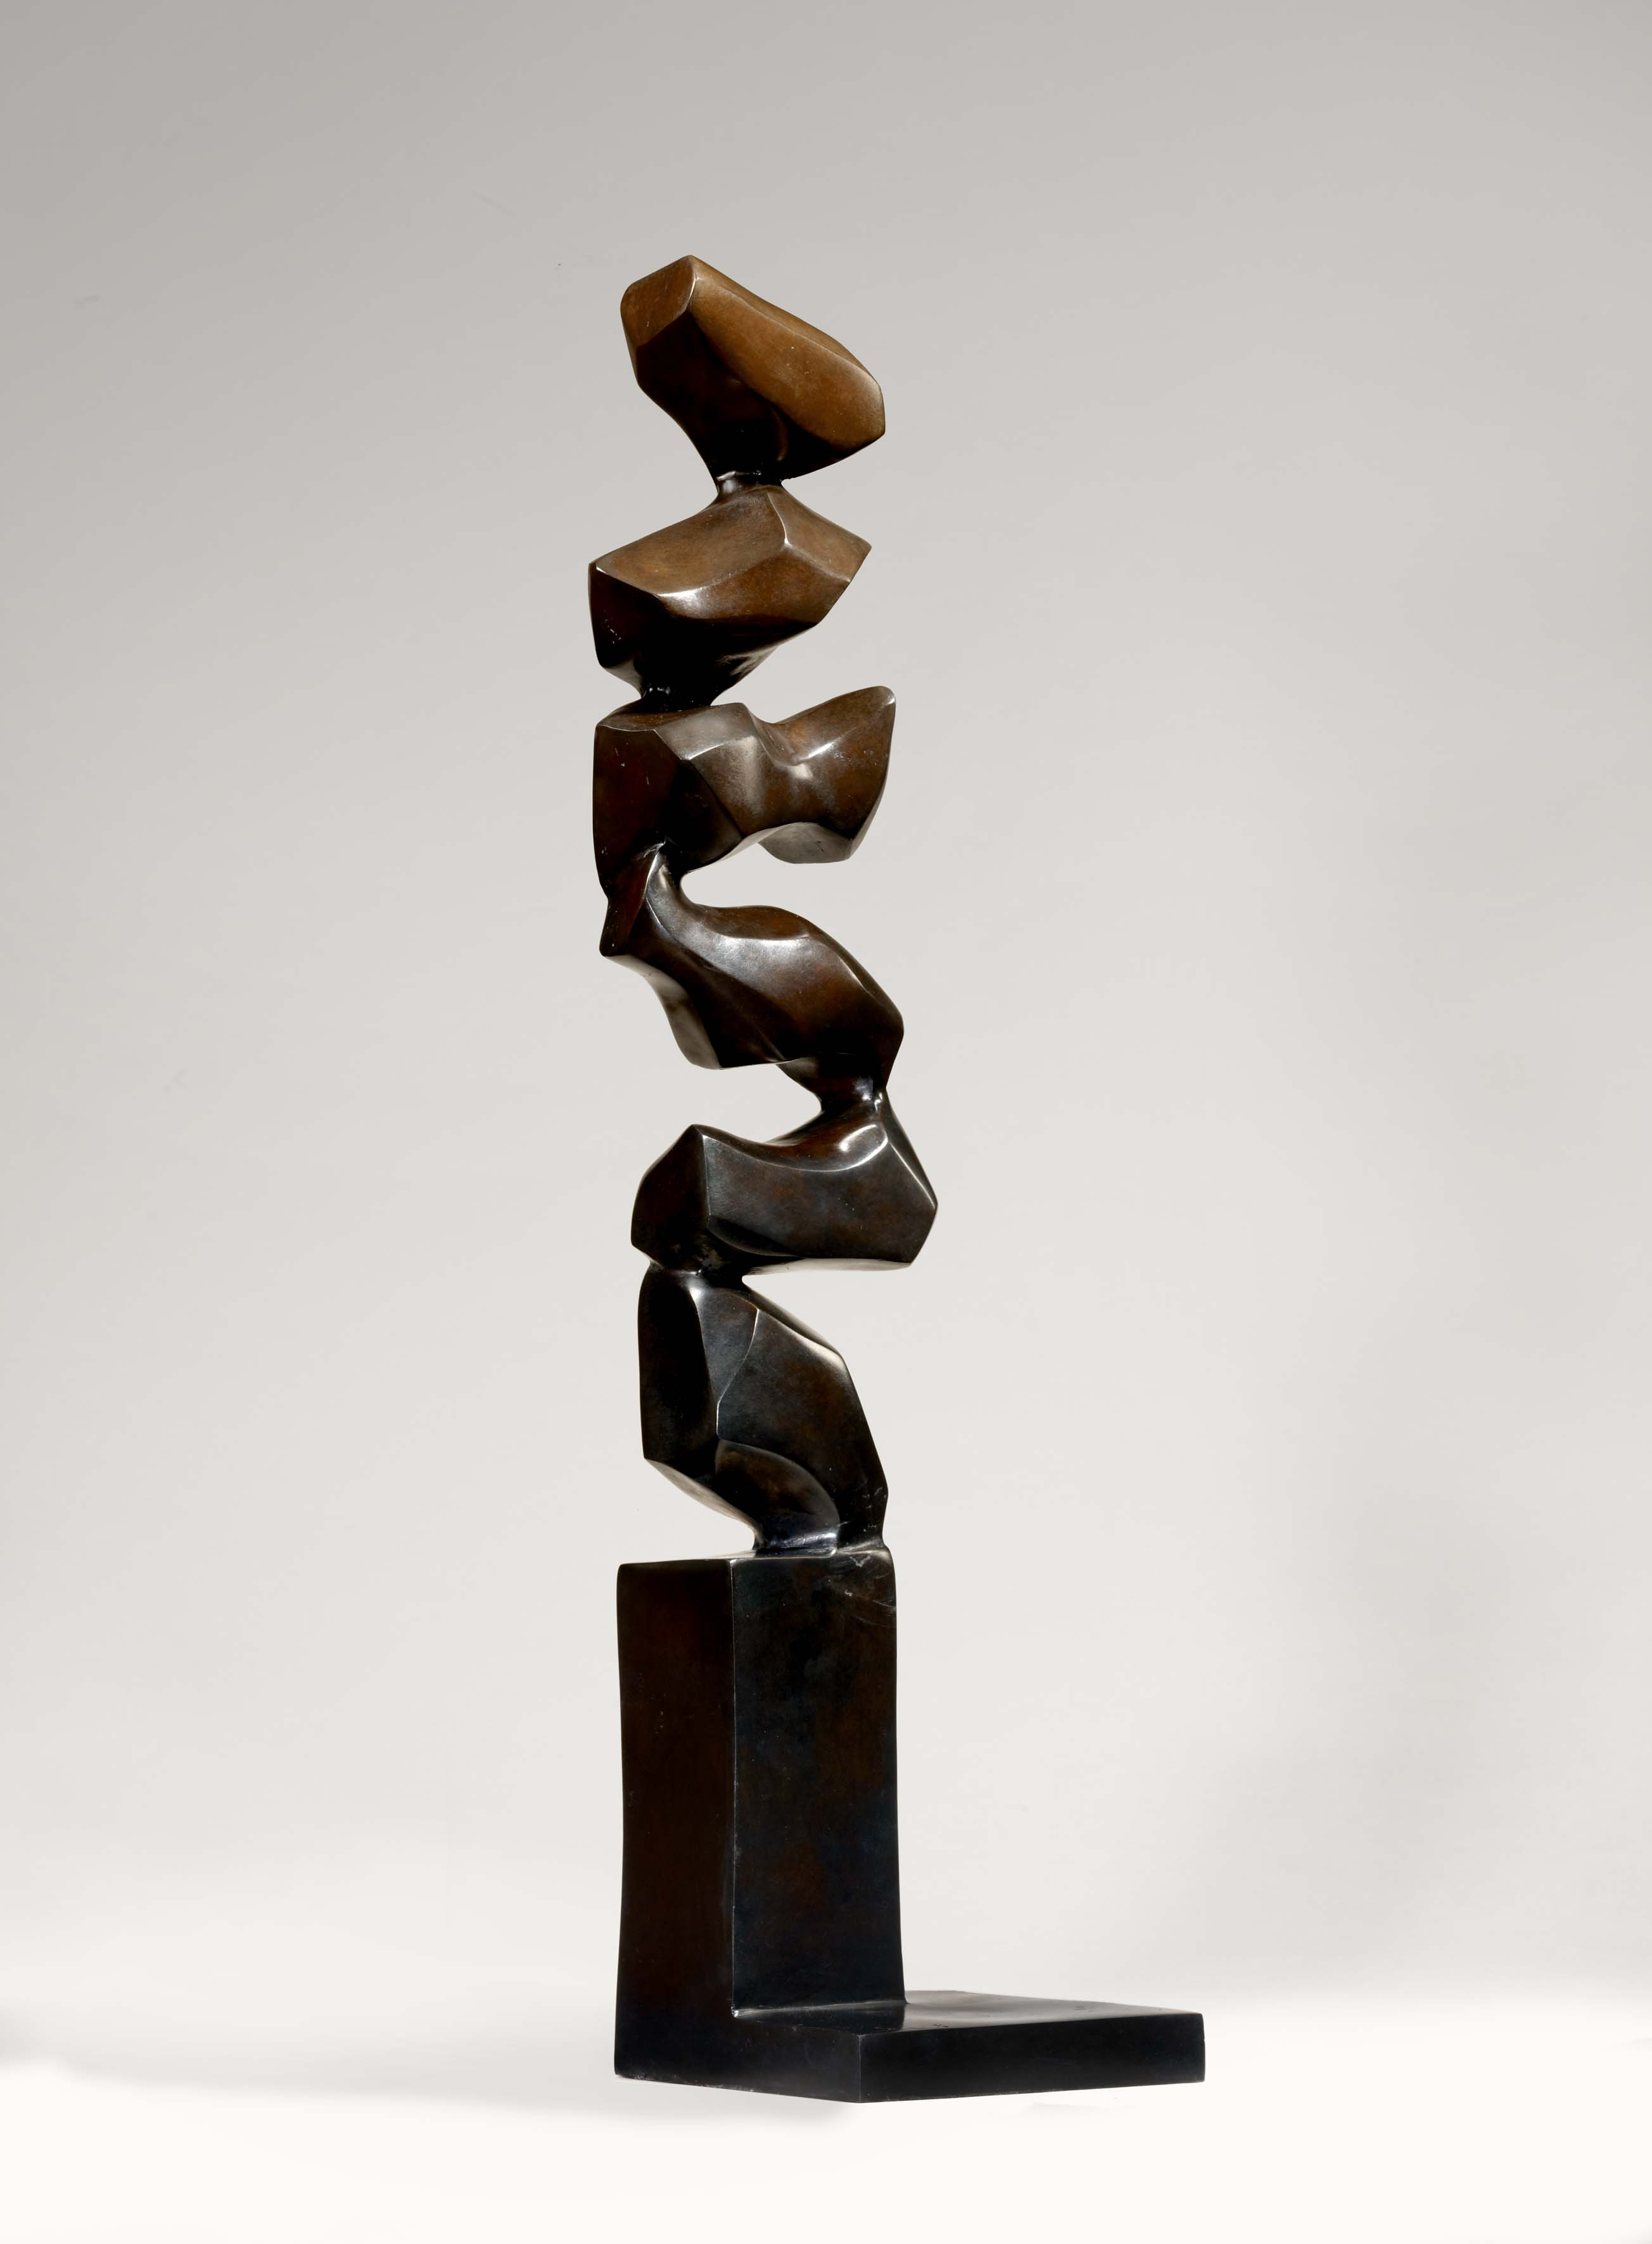 Totem, 2000 - 2003, 73 x 13 x 16 cm